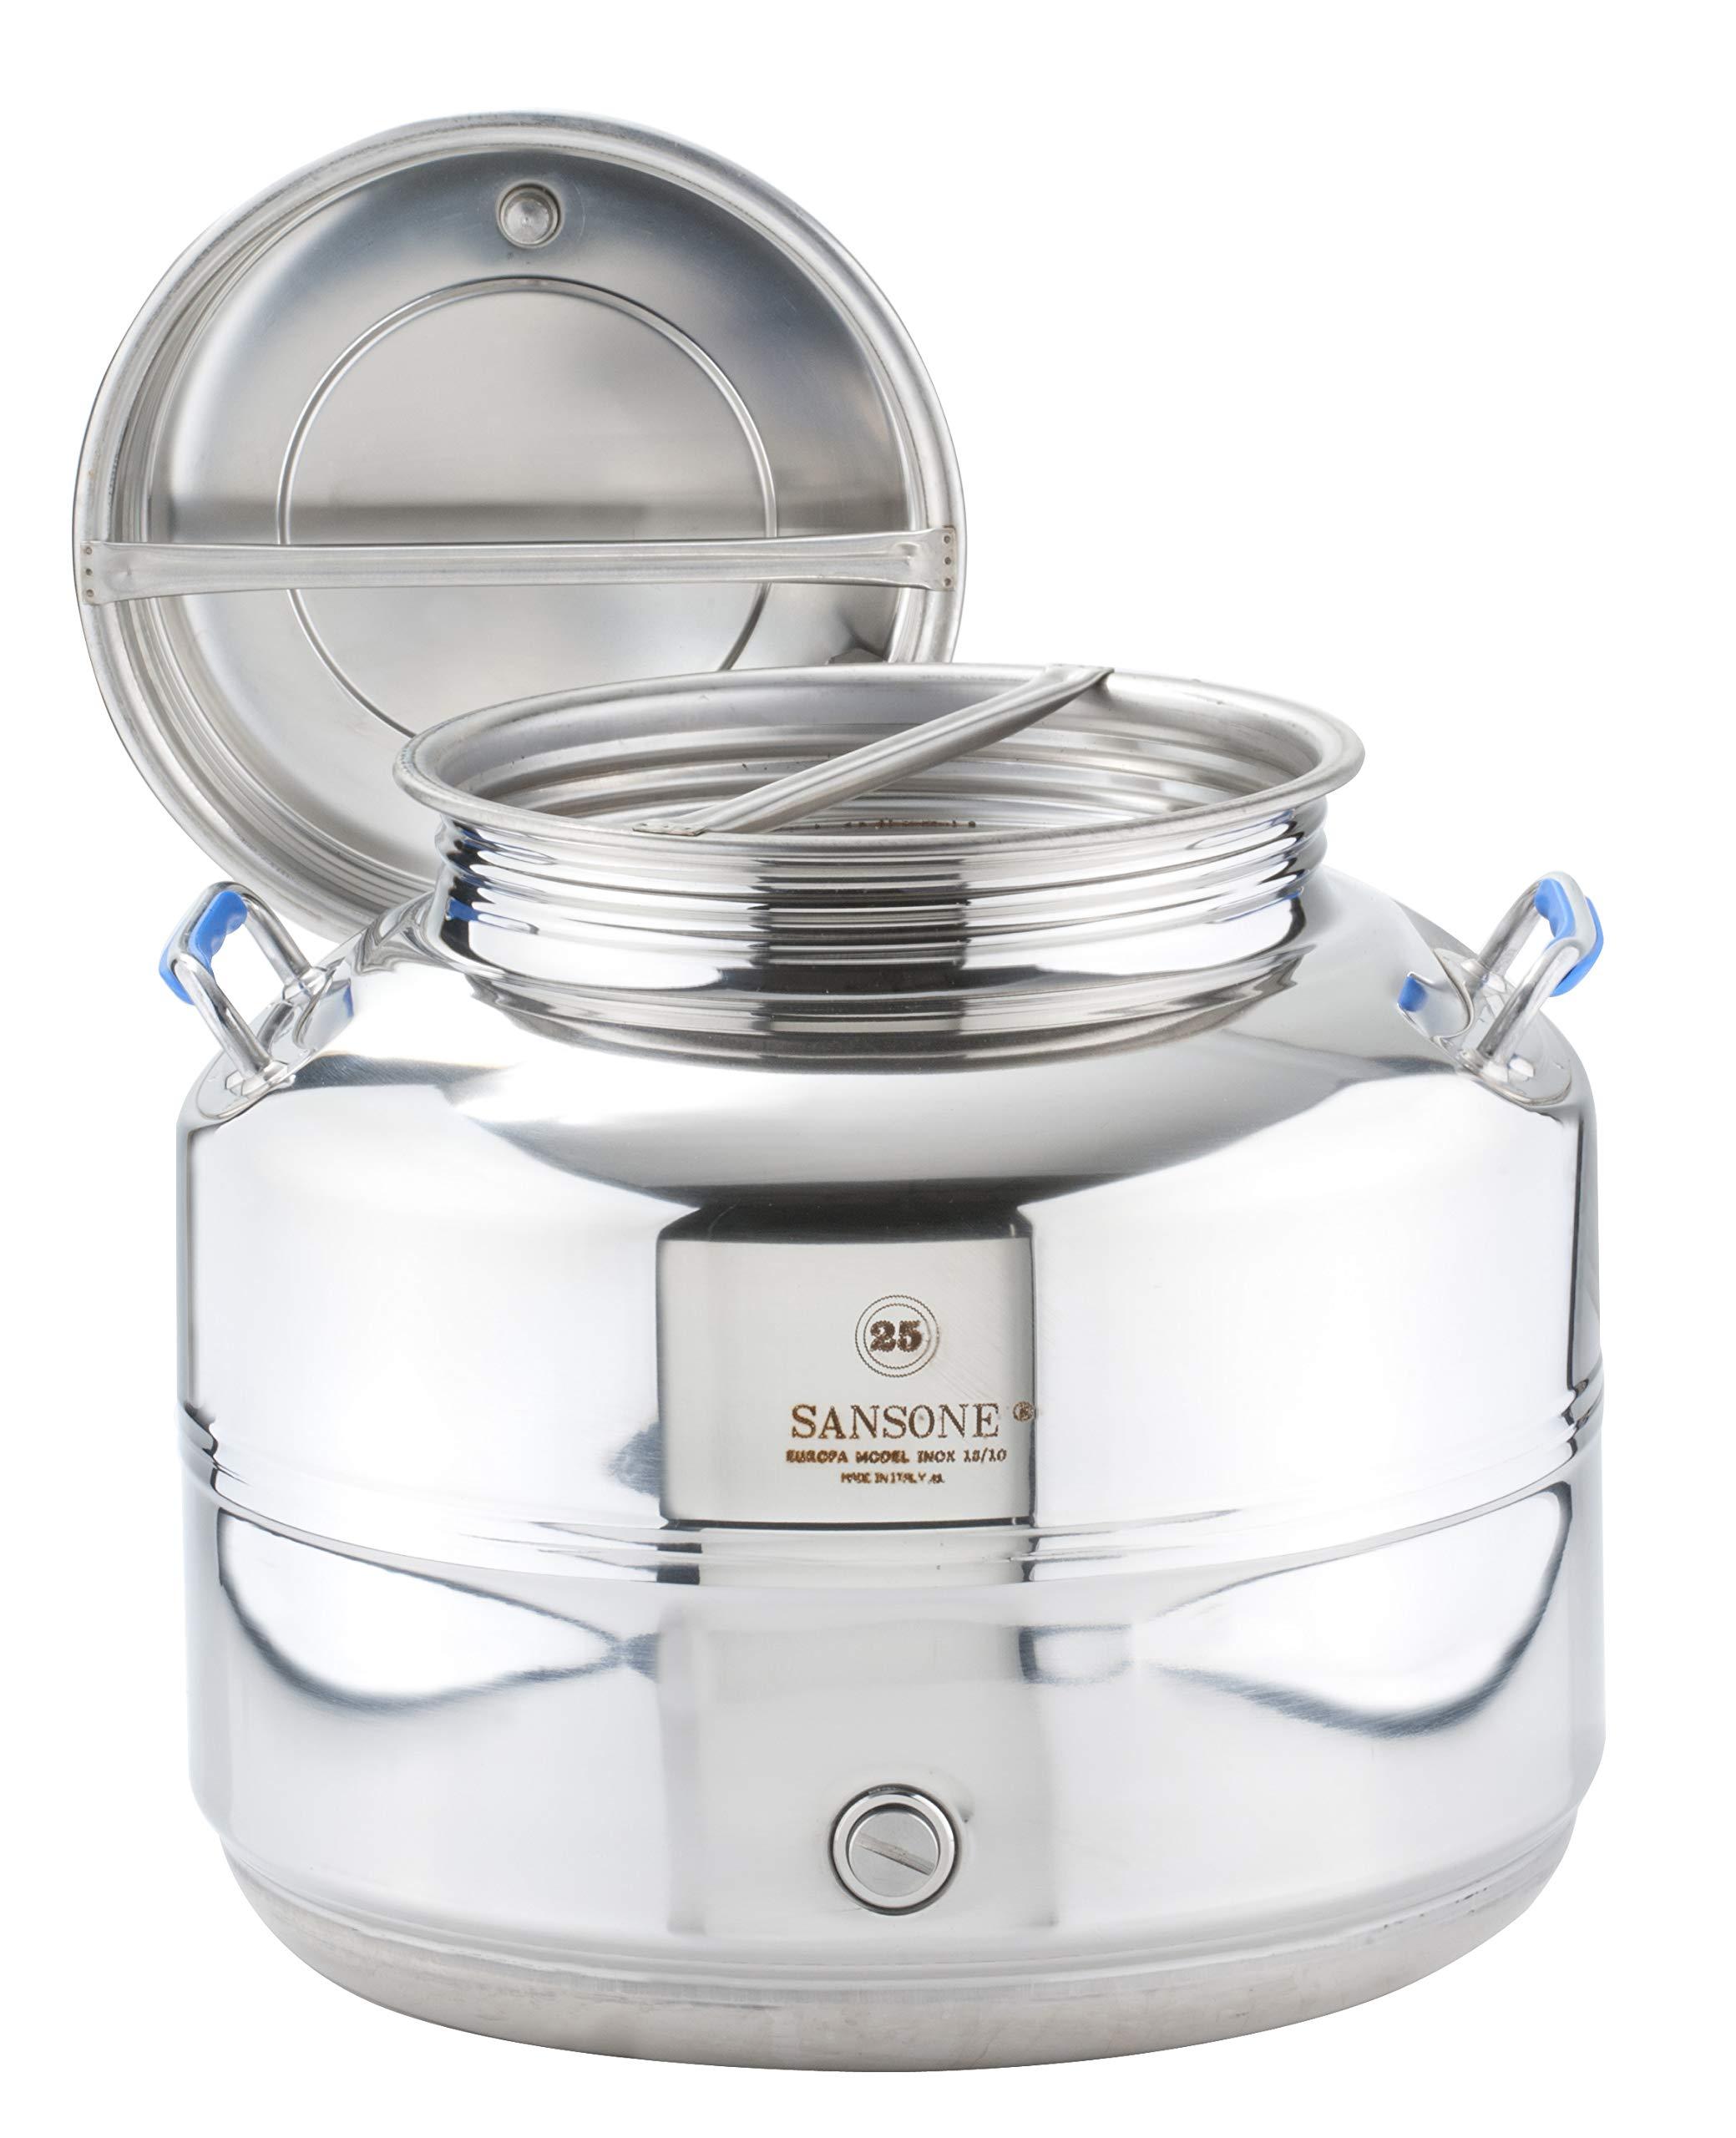 Sansone Stainless Steel Water Dispenser with Spigot, 6.6 gallon, 25 Liters, Silver